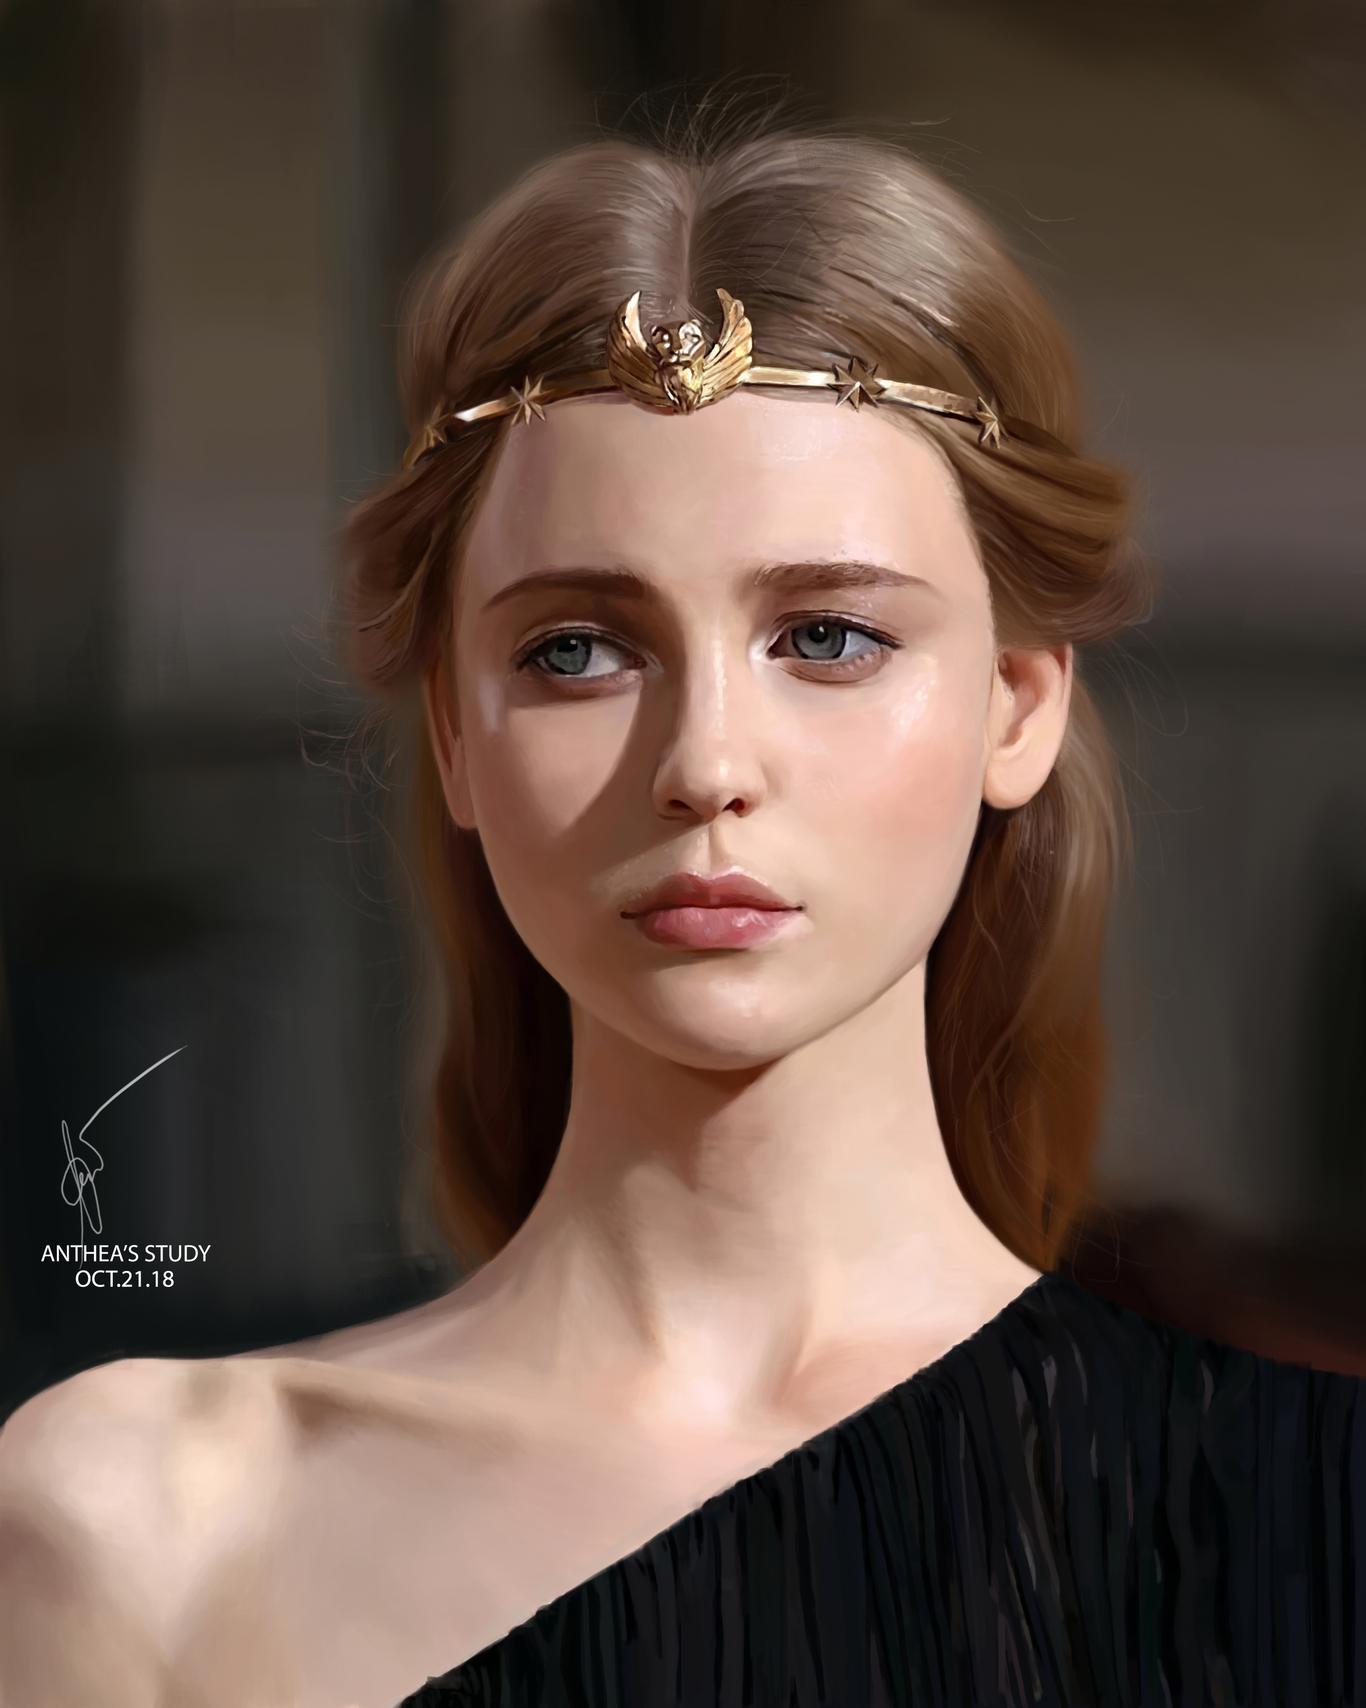 Anthea lee portrait study on th 1 57c7b680 35ge